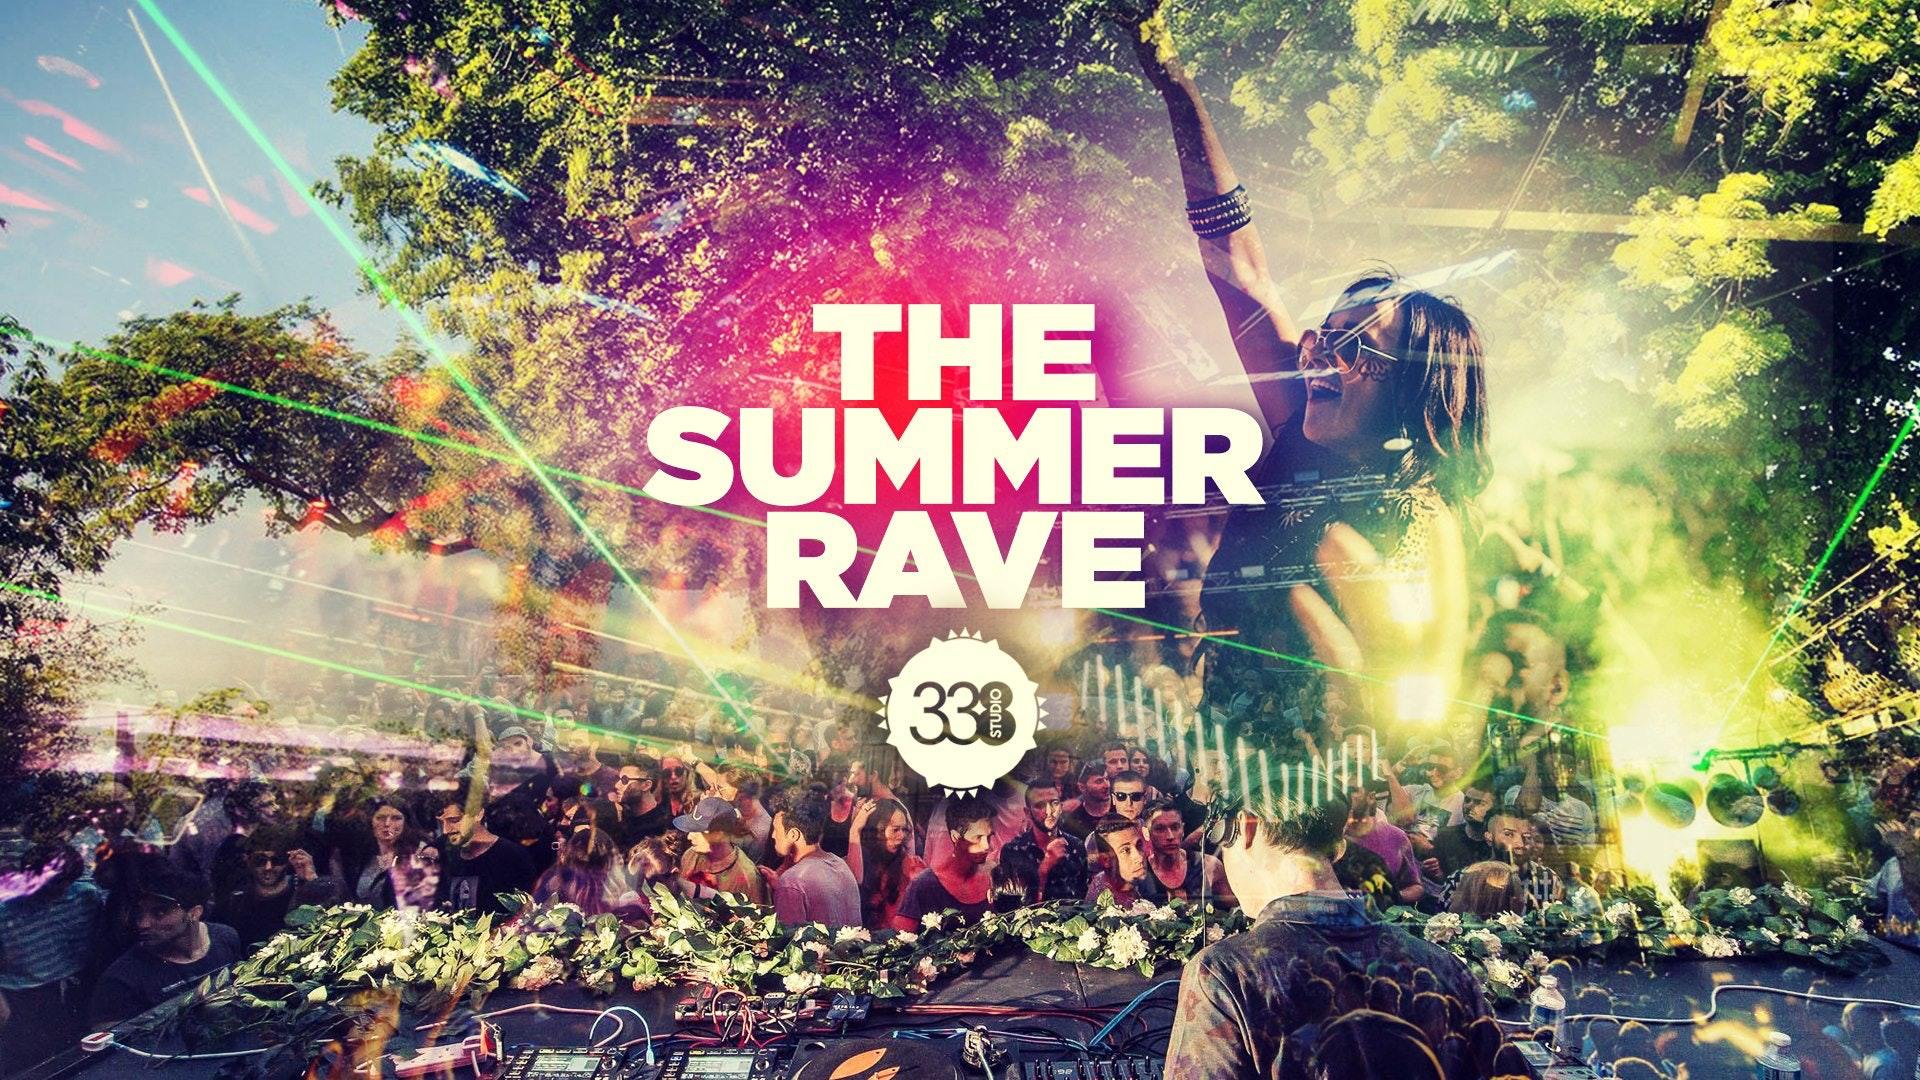 The Summer Rave 2019 at Studio 338 – Friday May 31st 2019